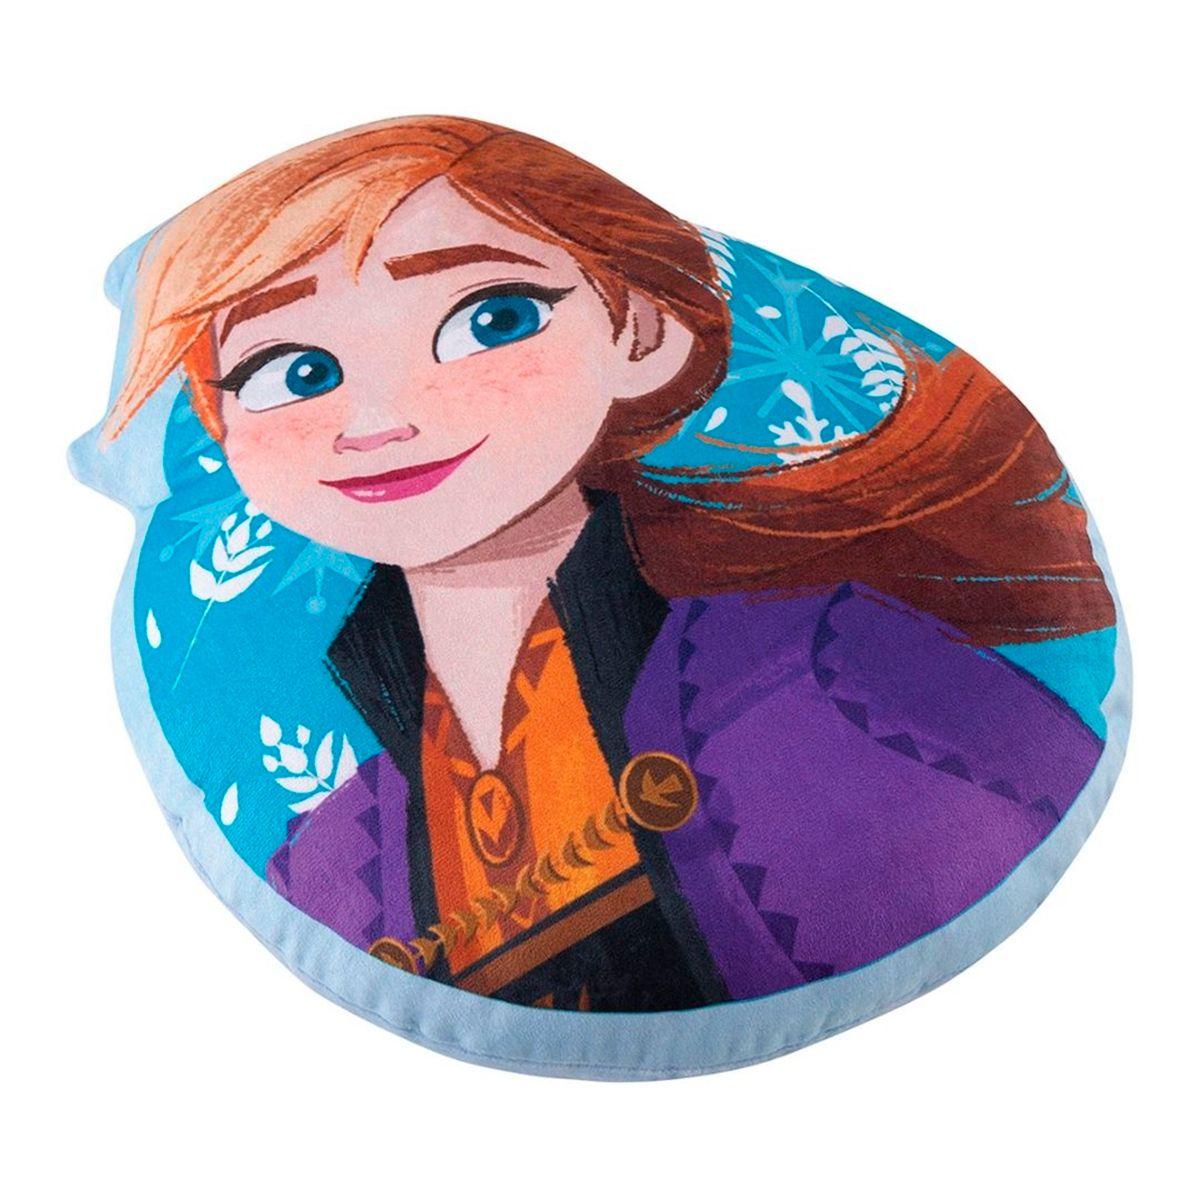 Almofada infantil transfer Frozen Anna 34x 40cm